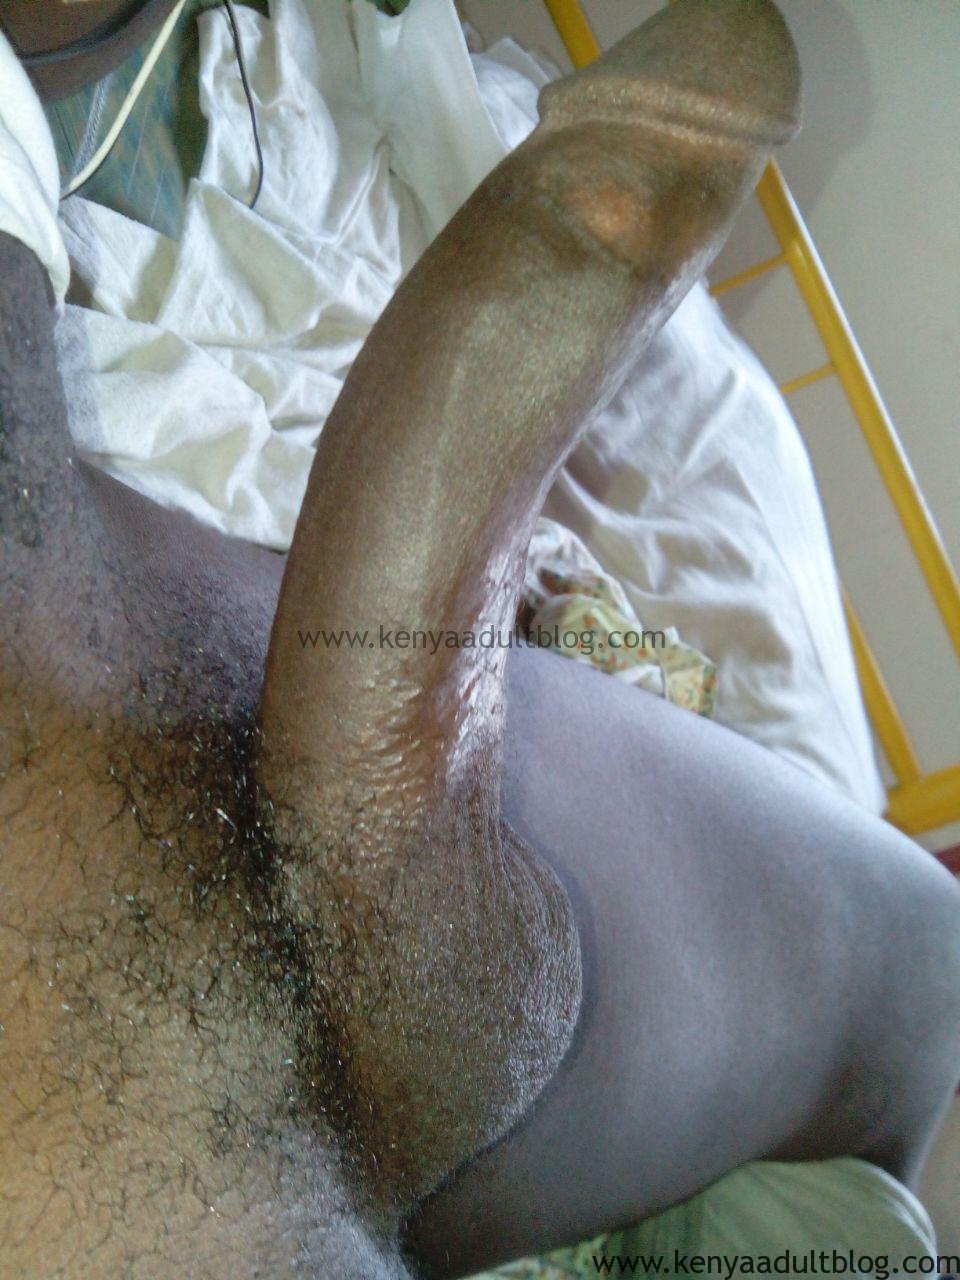 Big Kenyan Dick Horny Pics